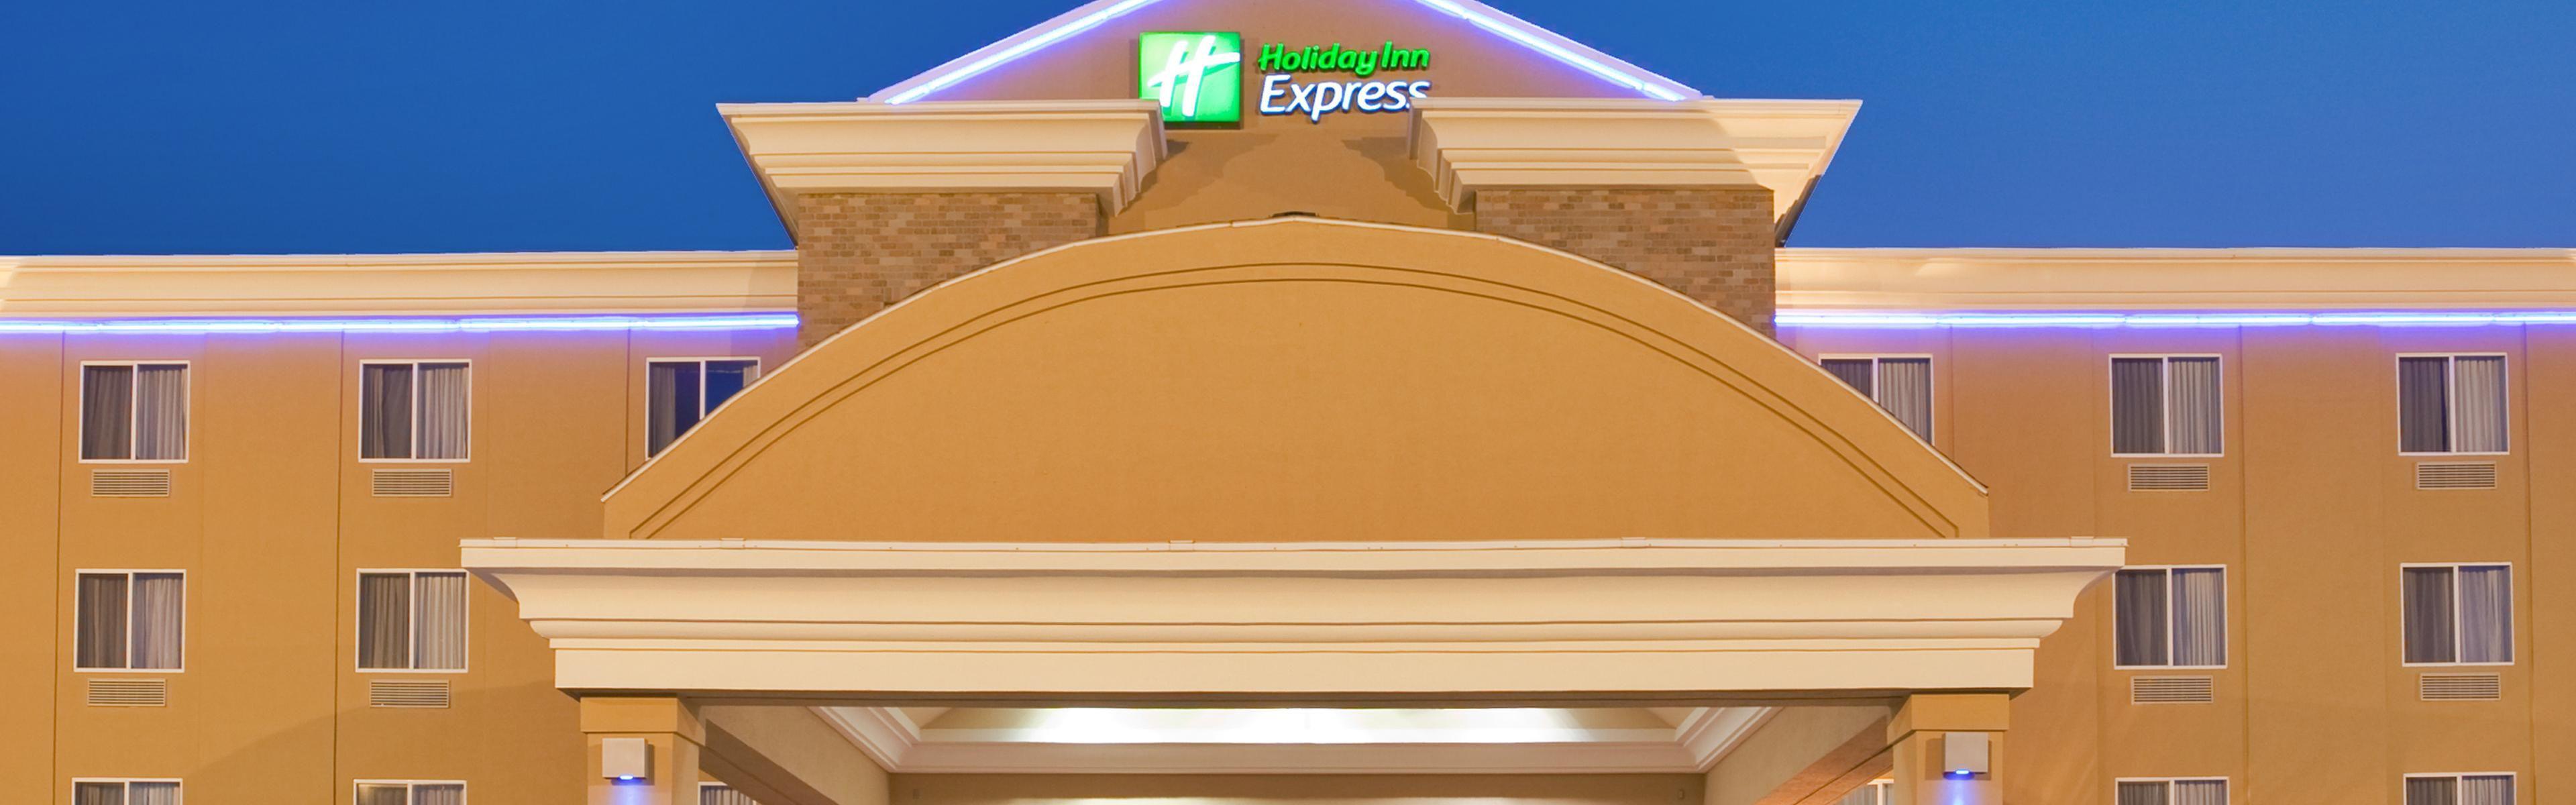 Holiday Inn Express Kearney image 0